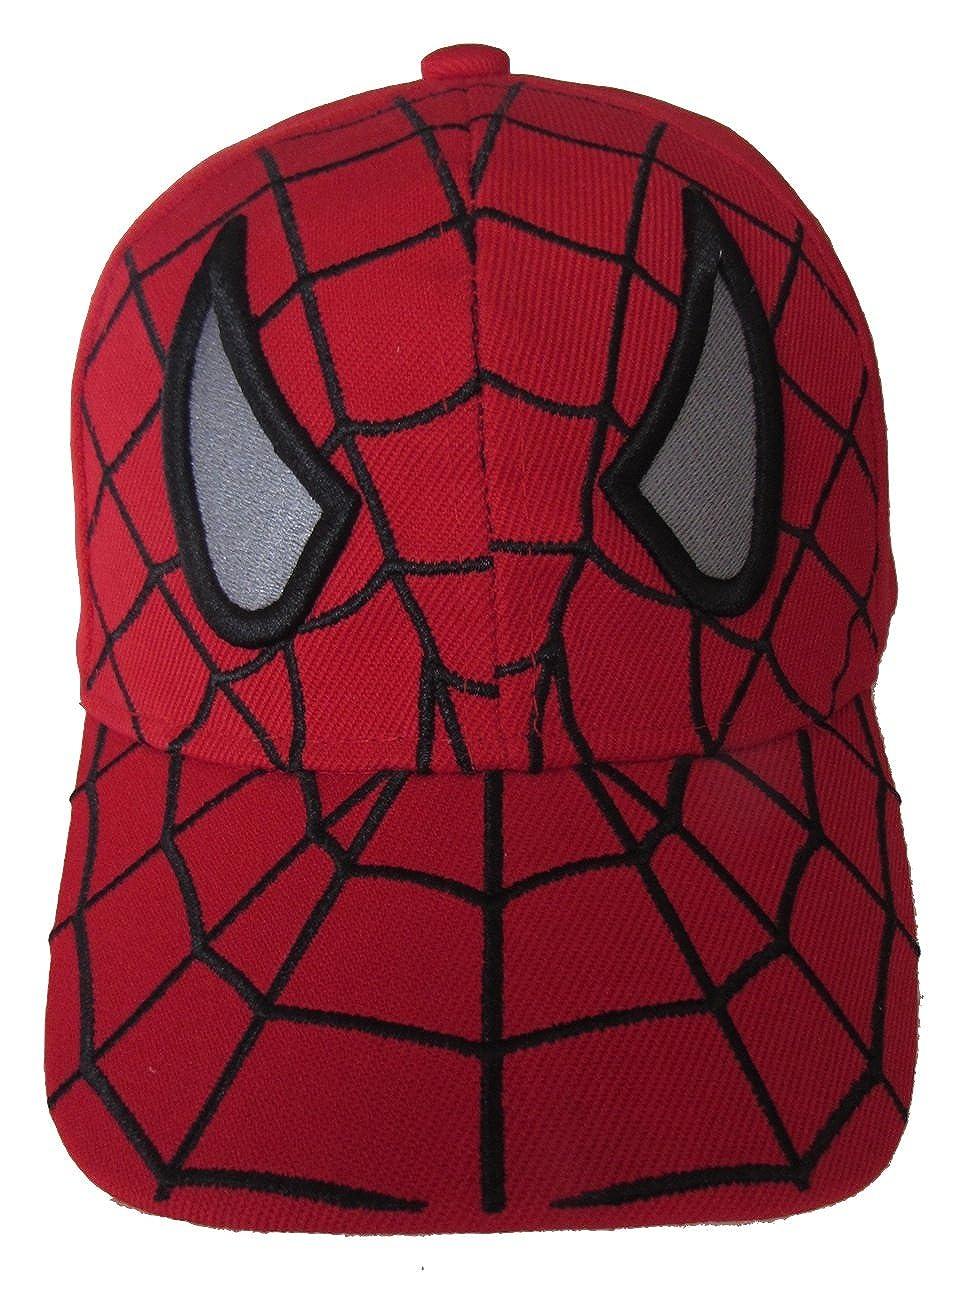 3eafef00ba1 Amazon.com  Kid s Youth Spider Man Hat - Adjustable Baseball Cap (Black  Spider)  Clothing